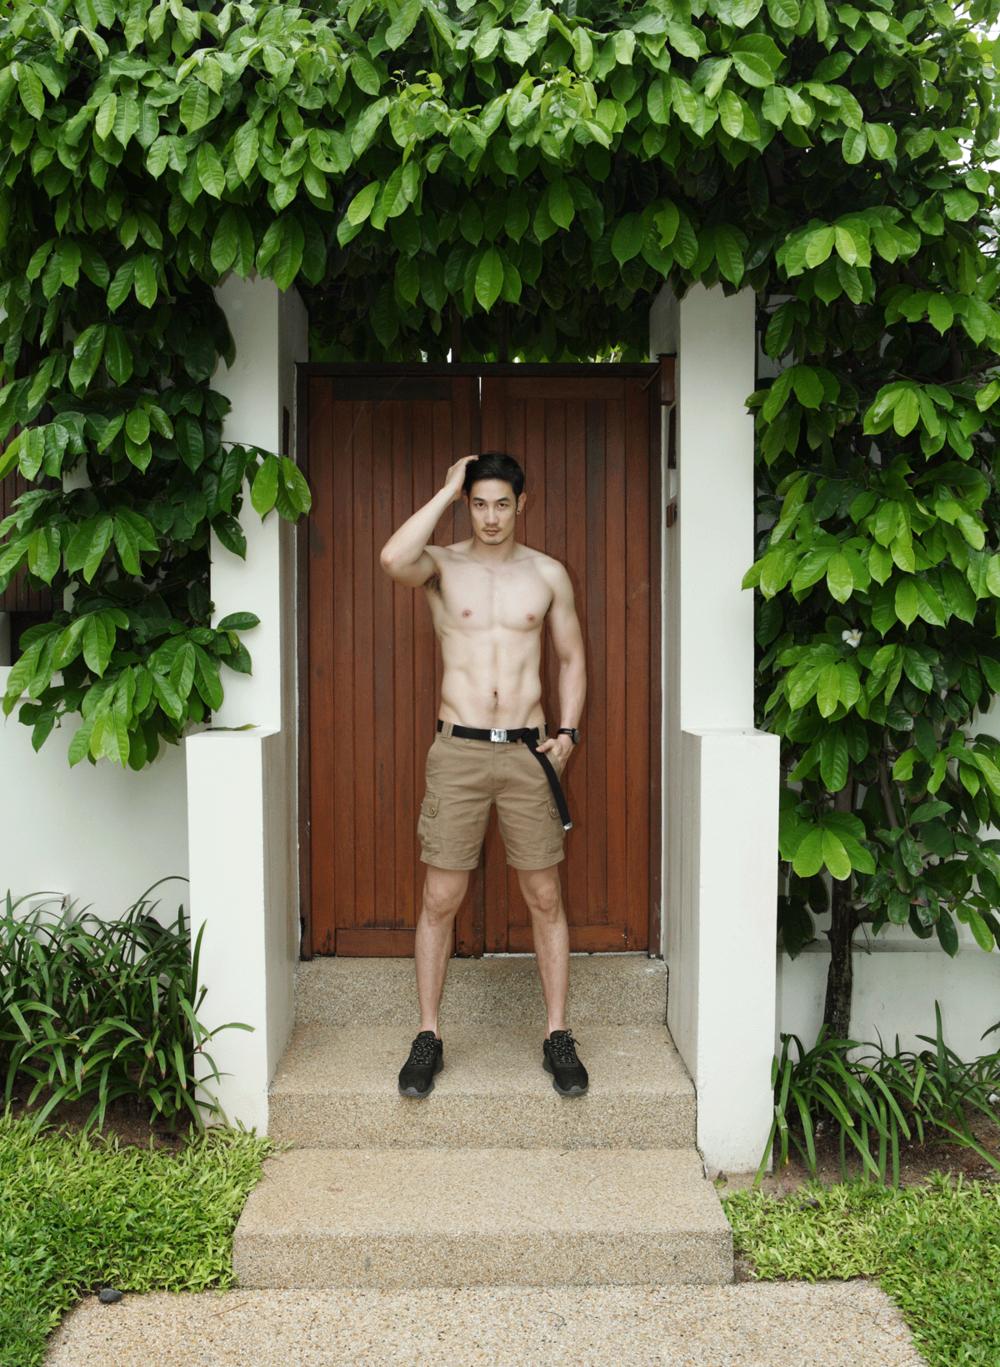 shorts : JBB* watch : MIDO Multifort